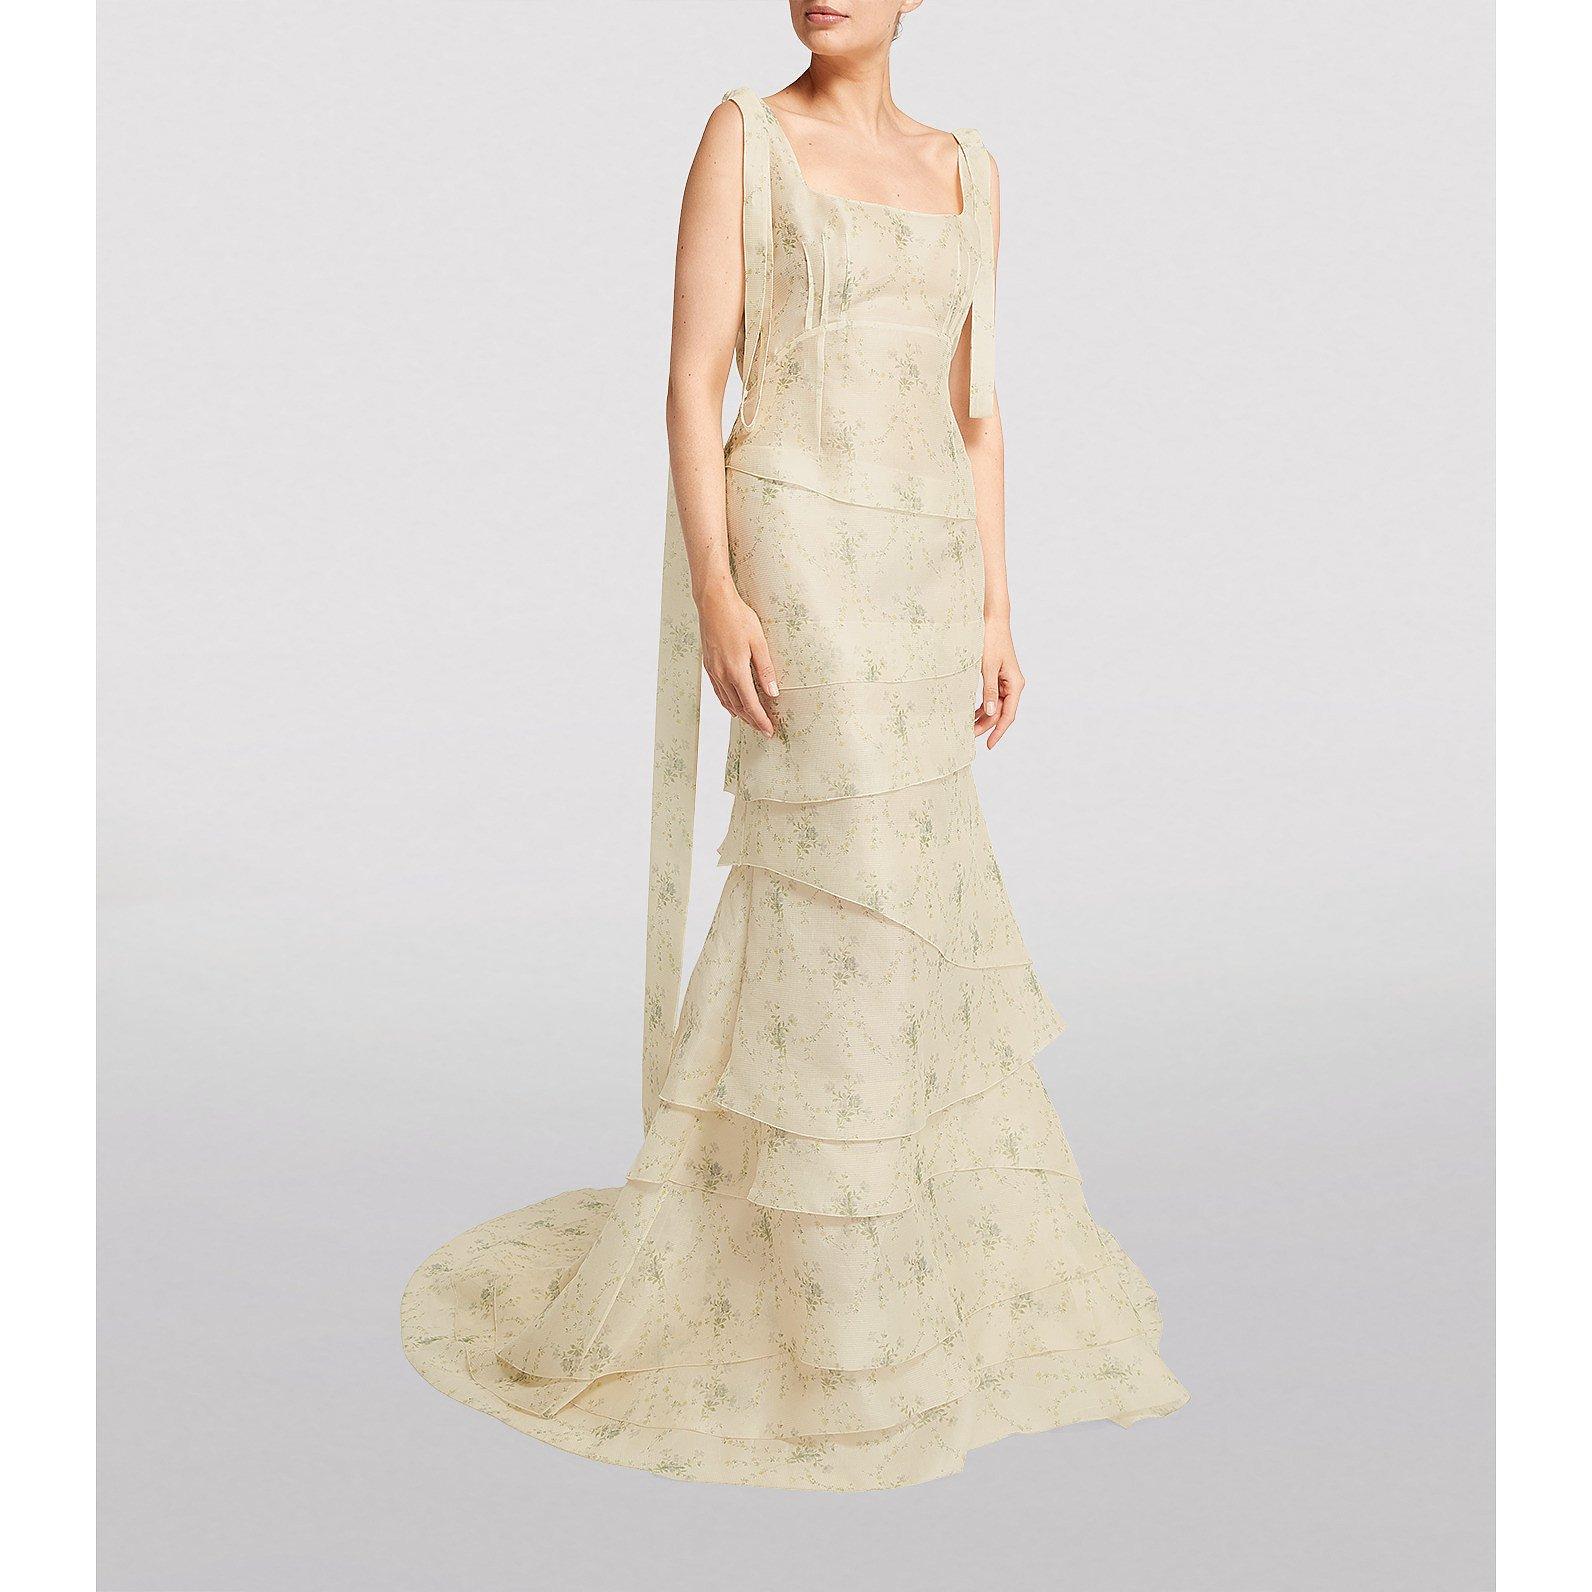 Brock Collection Silk Organza Shoulder-Tie Quarrie Gown